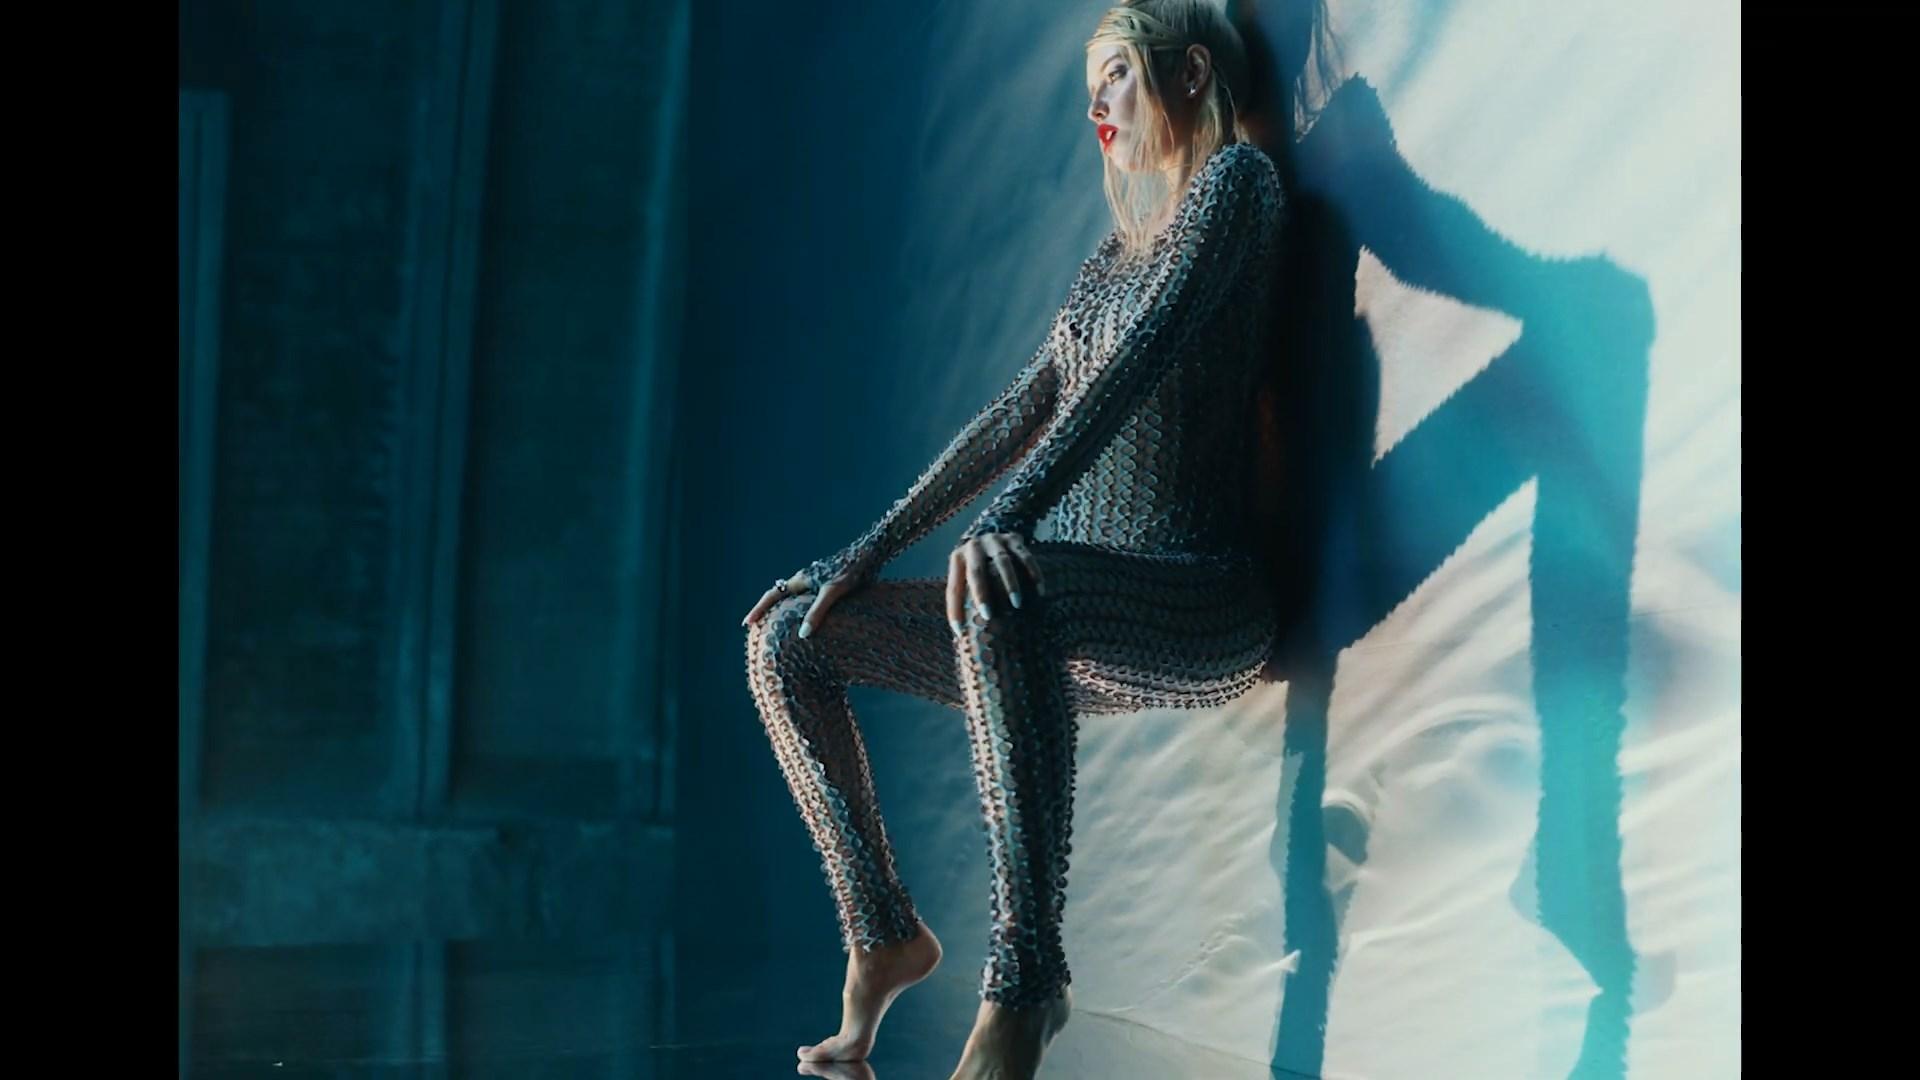 DOROFEEVA - gorit (Official Music Video).mp4_snapshot_02.21_[2020.11.19_23.19.29].jpg